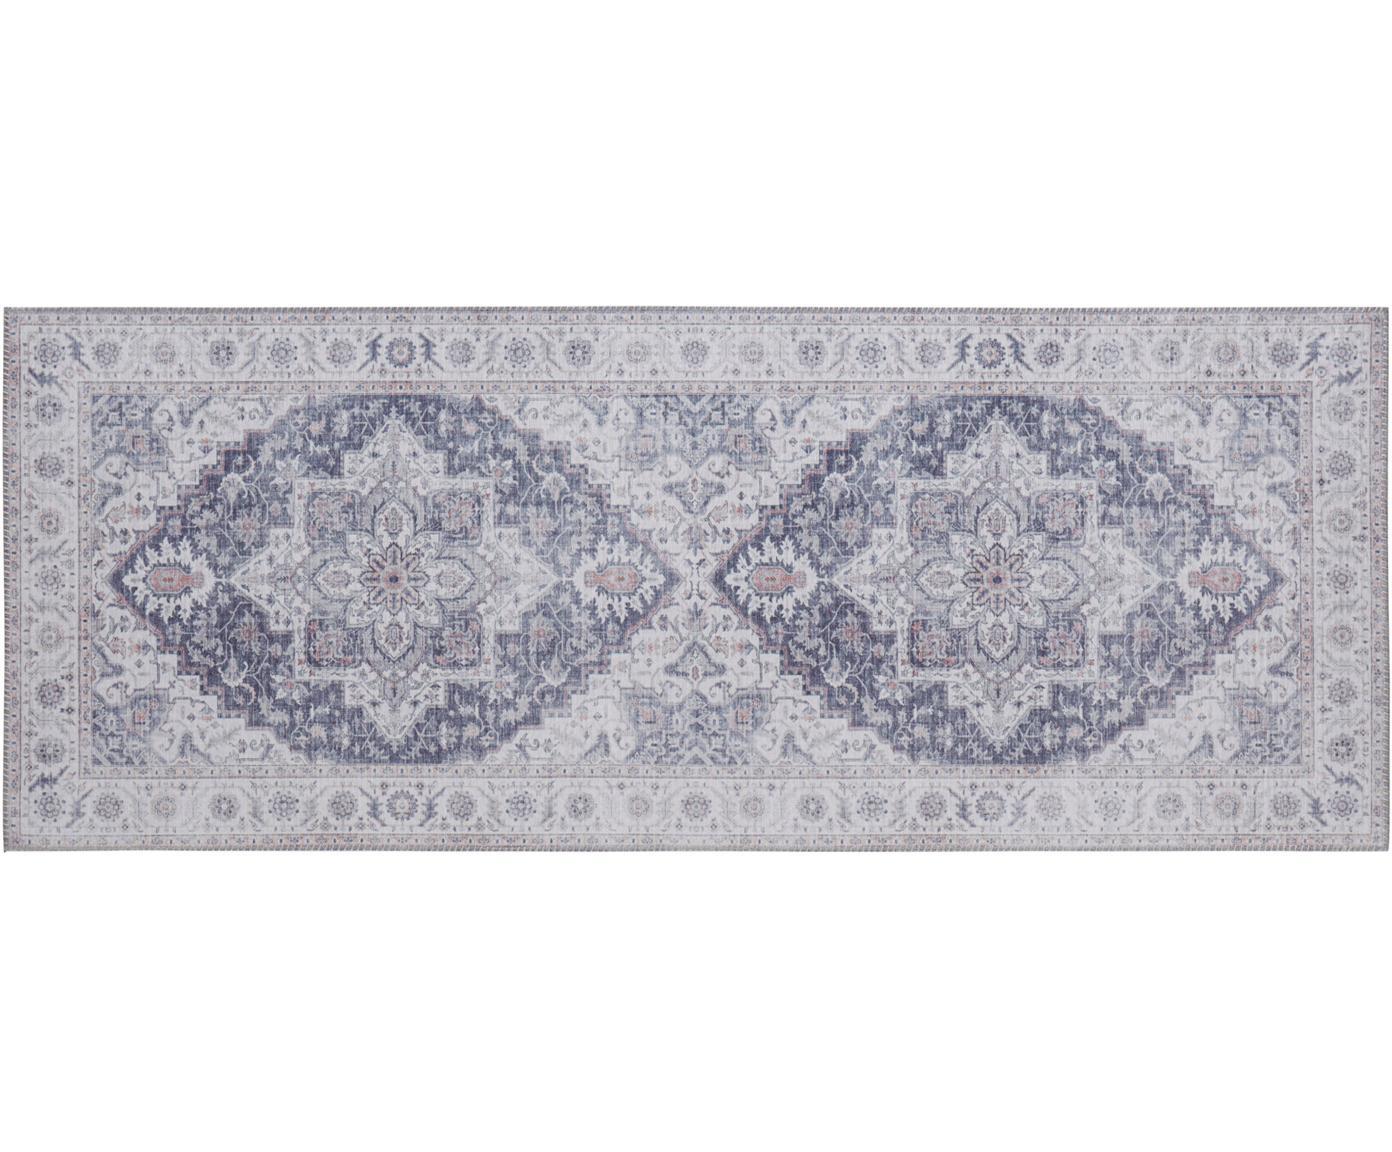 Loper Anthea in vintage stijl, Polyester, Mauve, zilvergrijs, 80 x 200 cm